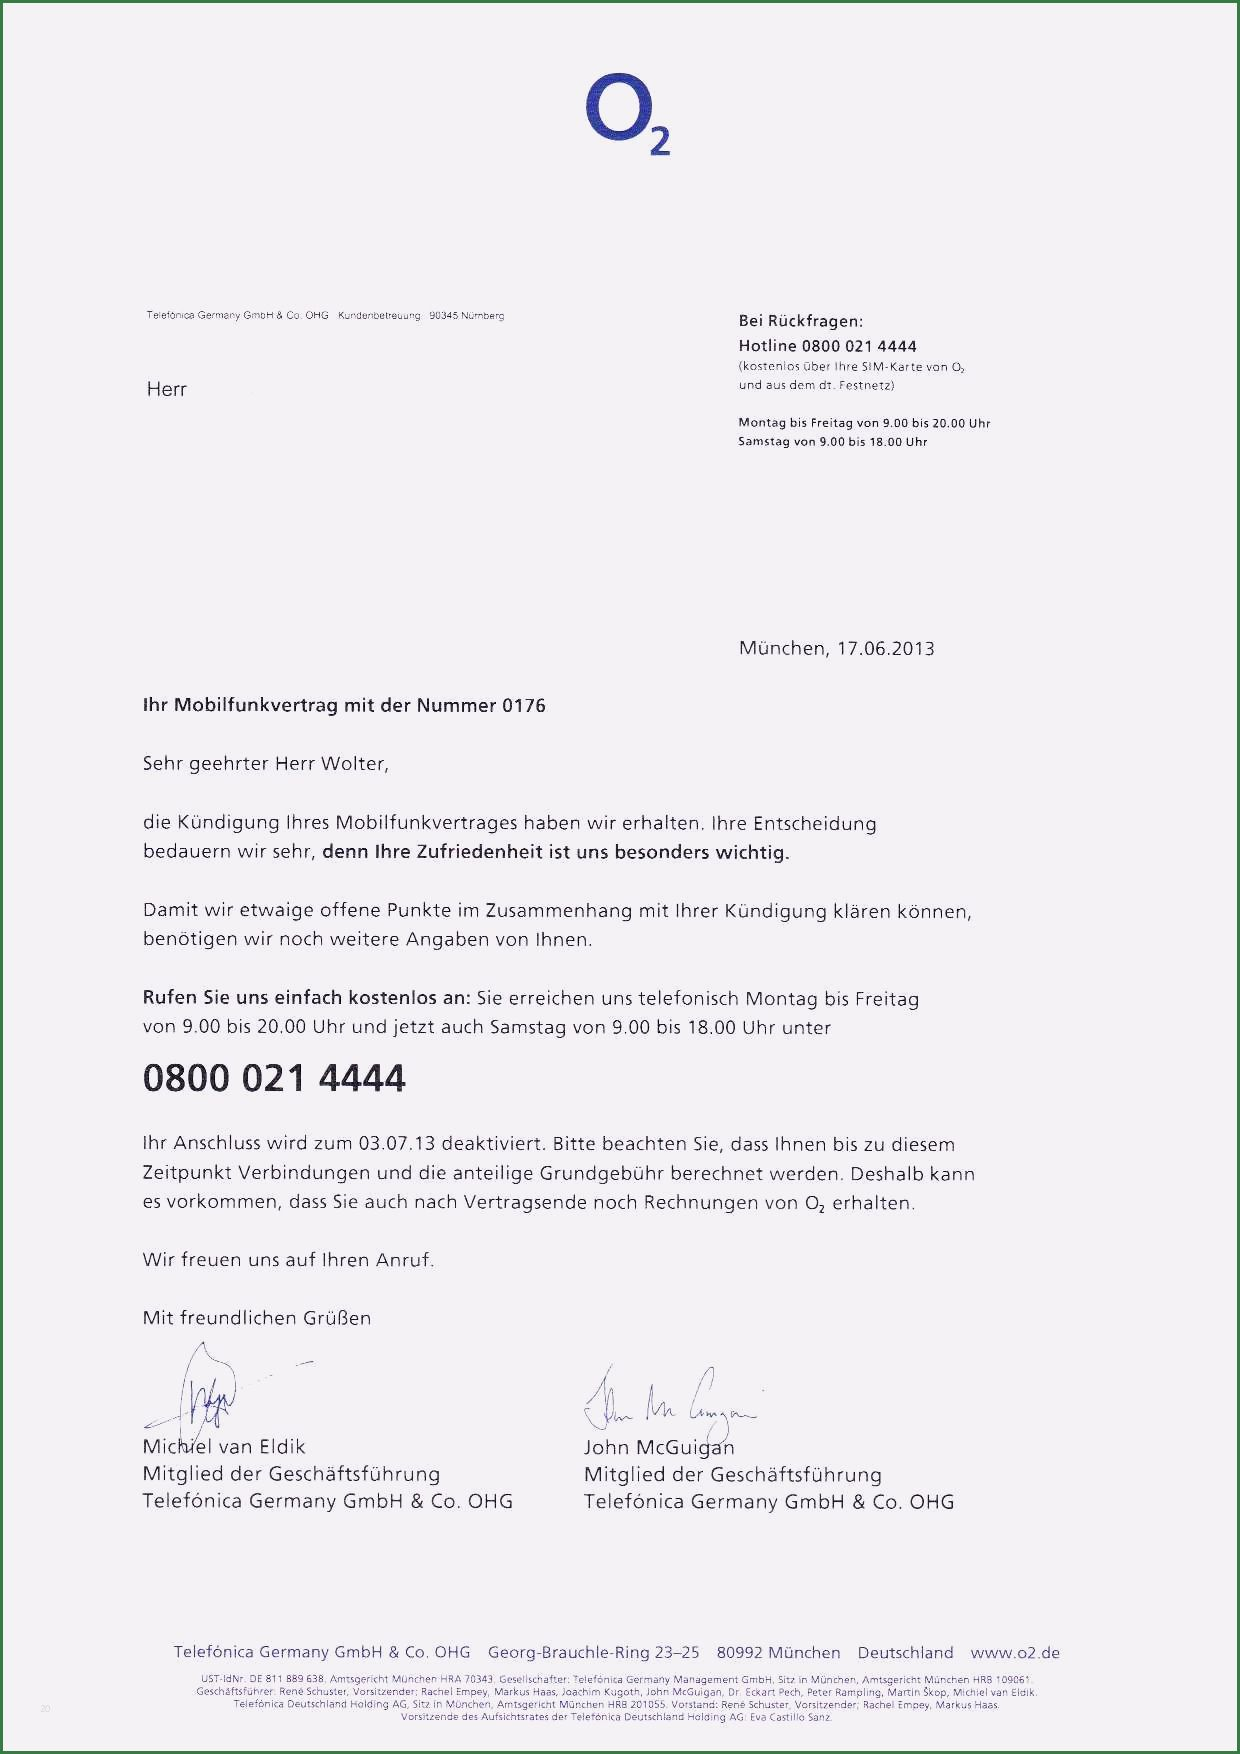 O2 Handyvertrag Online Kundigen Geprufte Vorlage